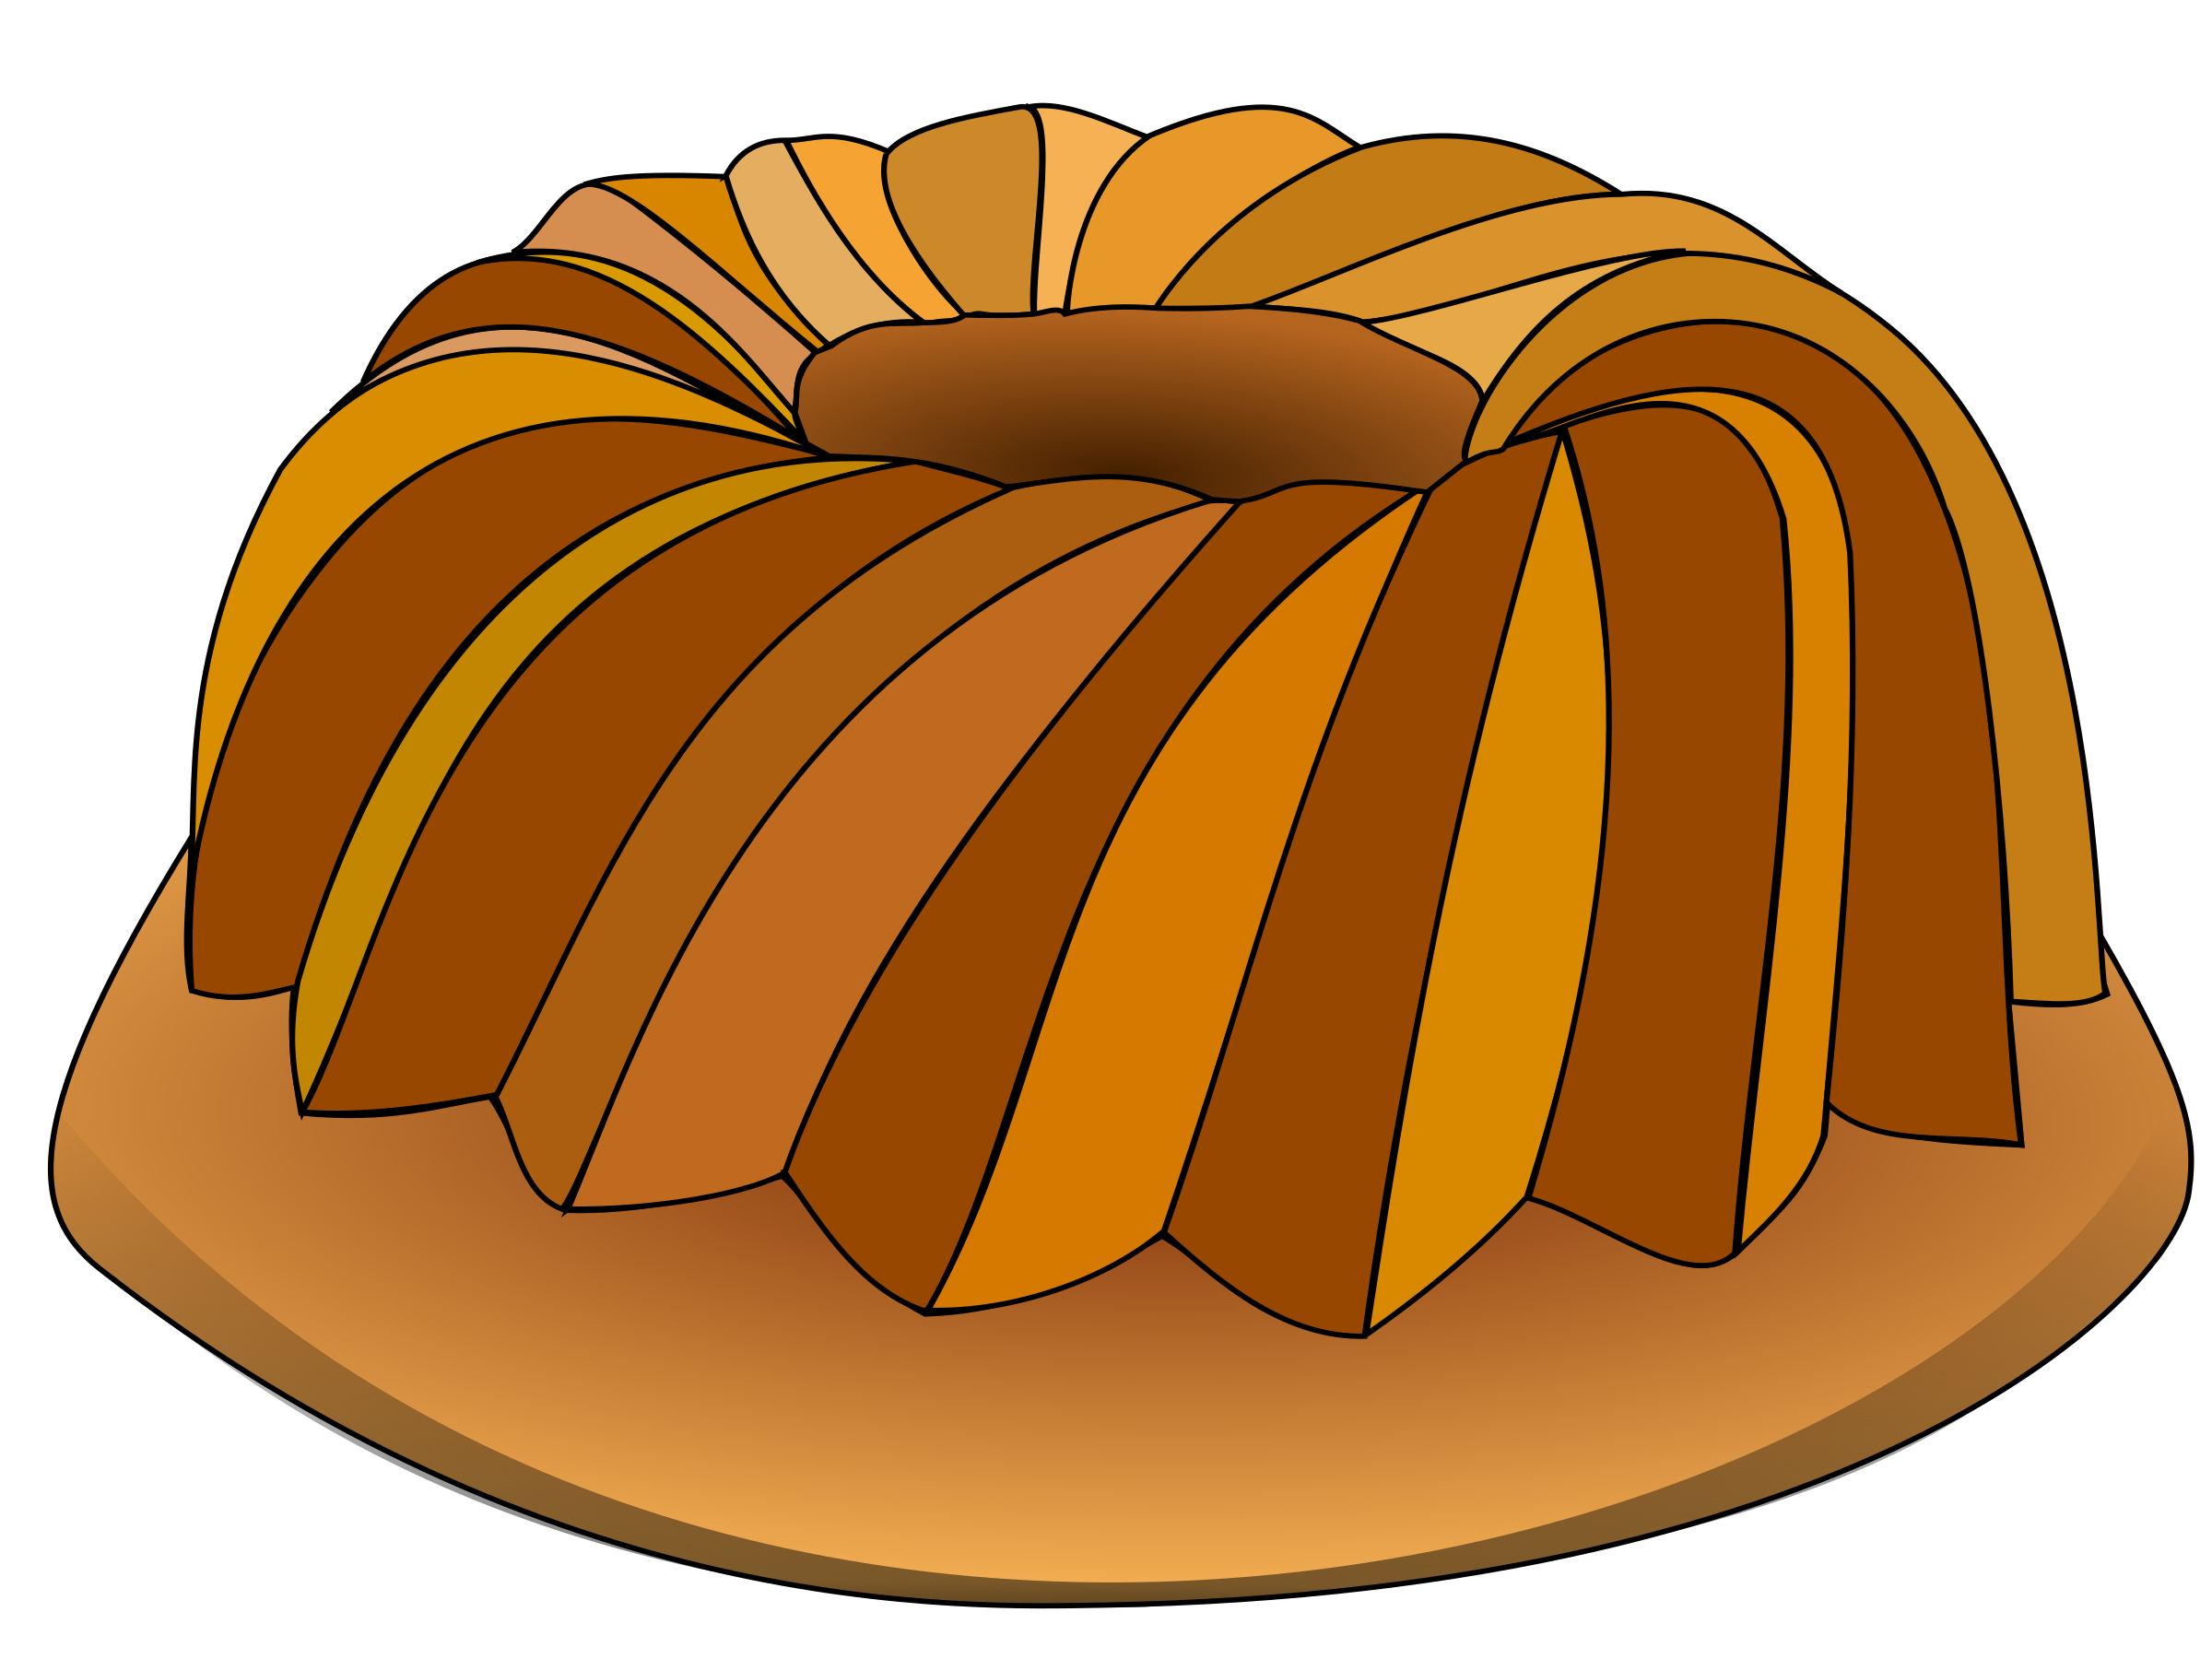 Free Stock Photo of Sliced Cake Vector Art - Public Domain ...